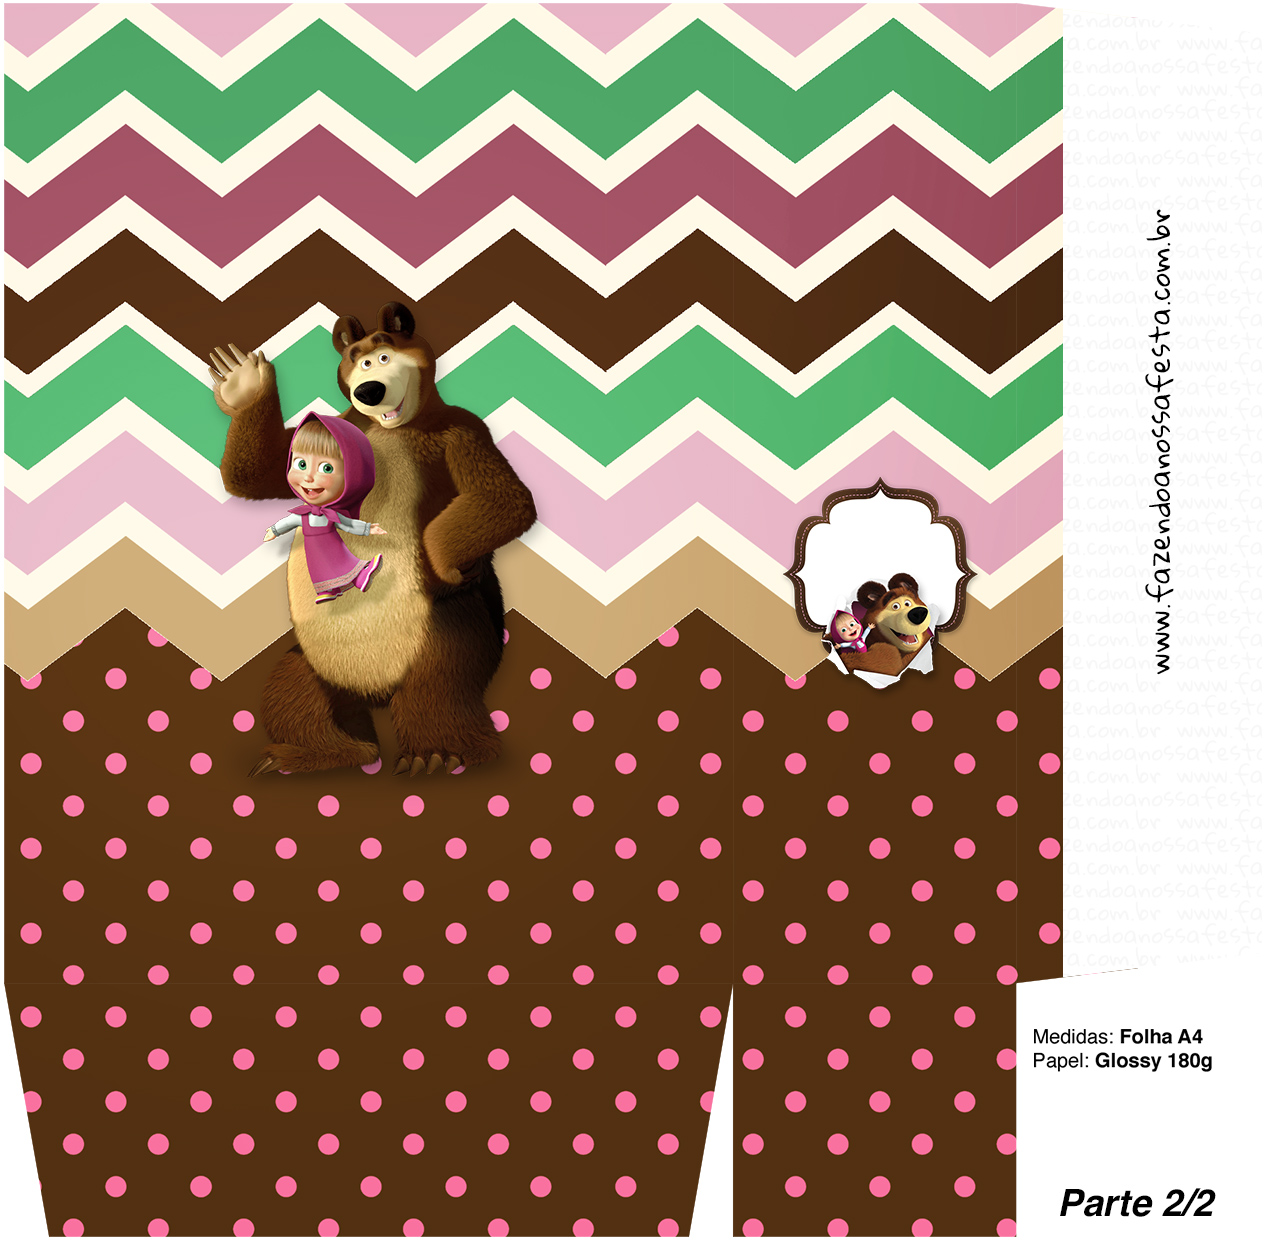 Sacolinha Surpresa 2 2 Masha e o Urso Kit